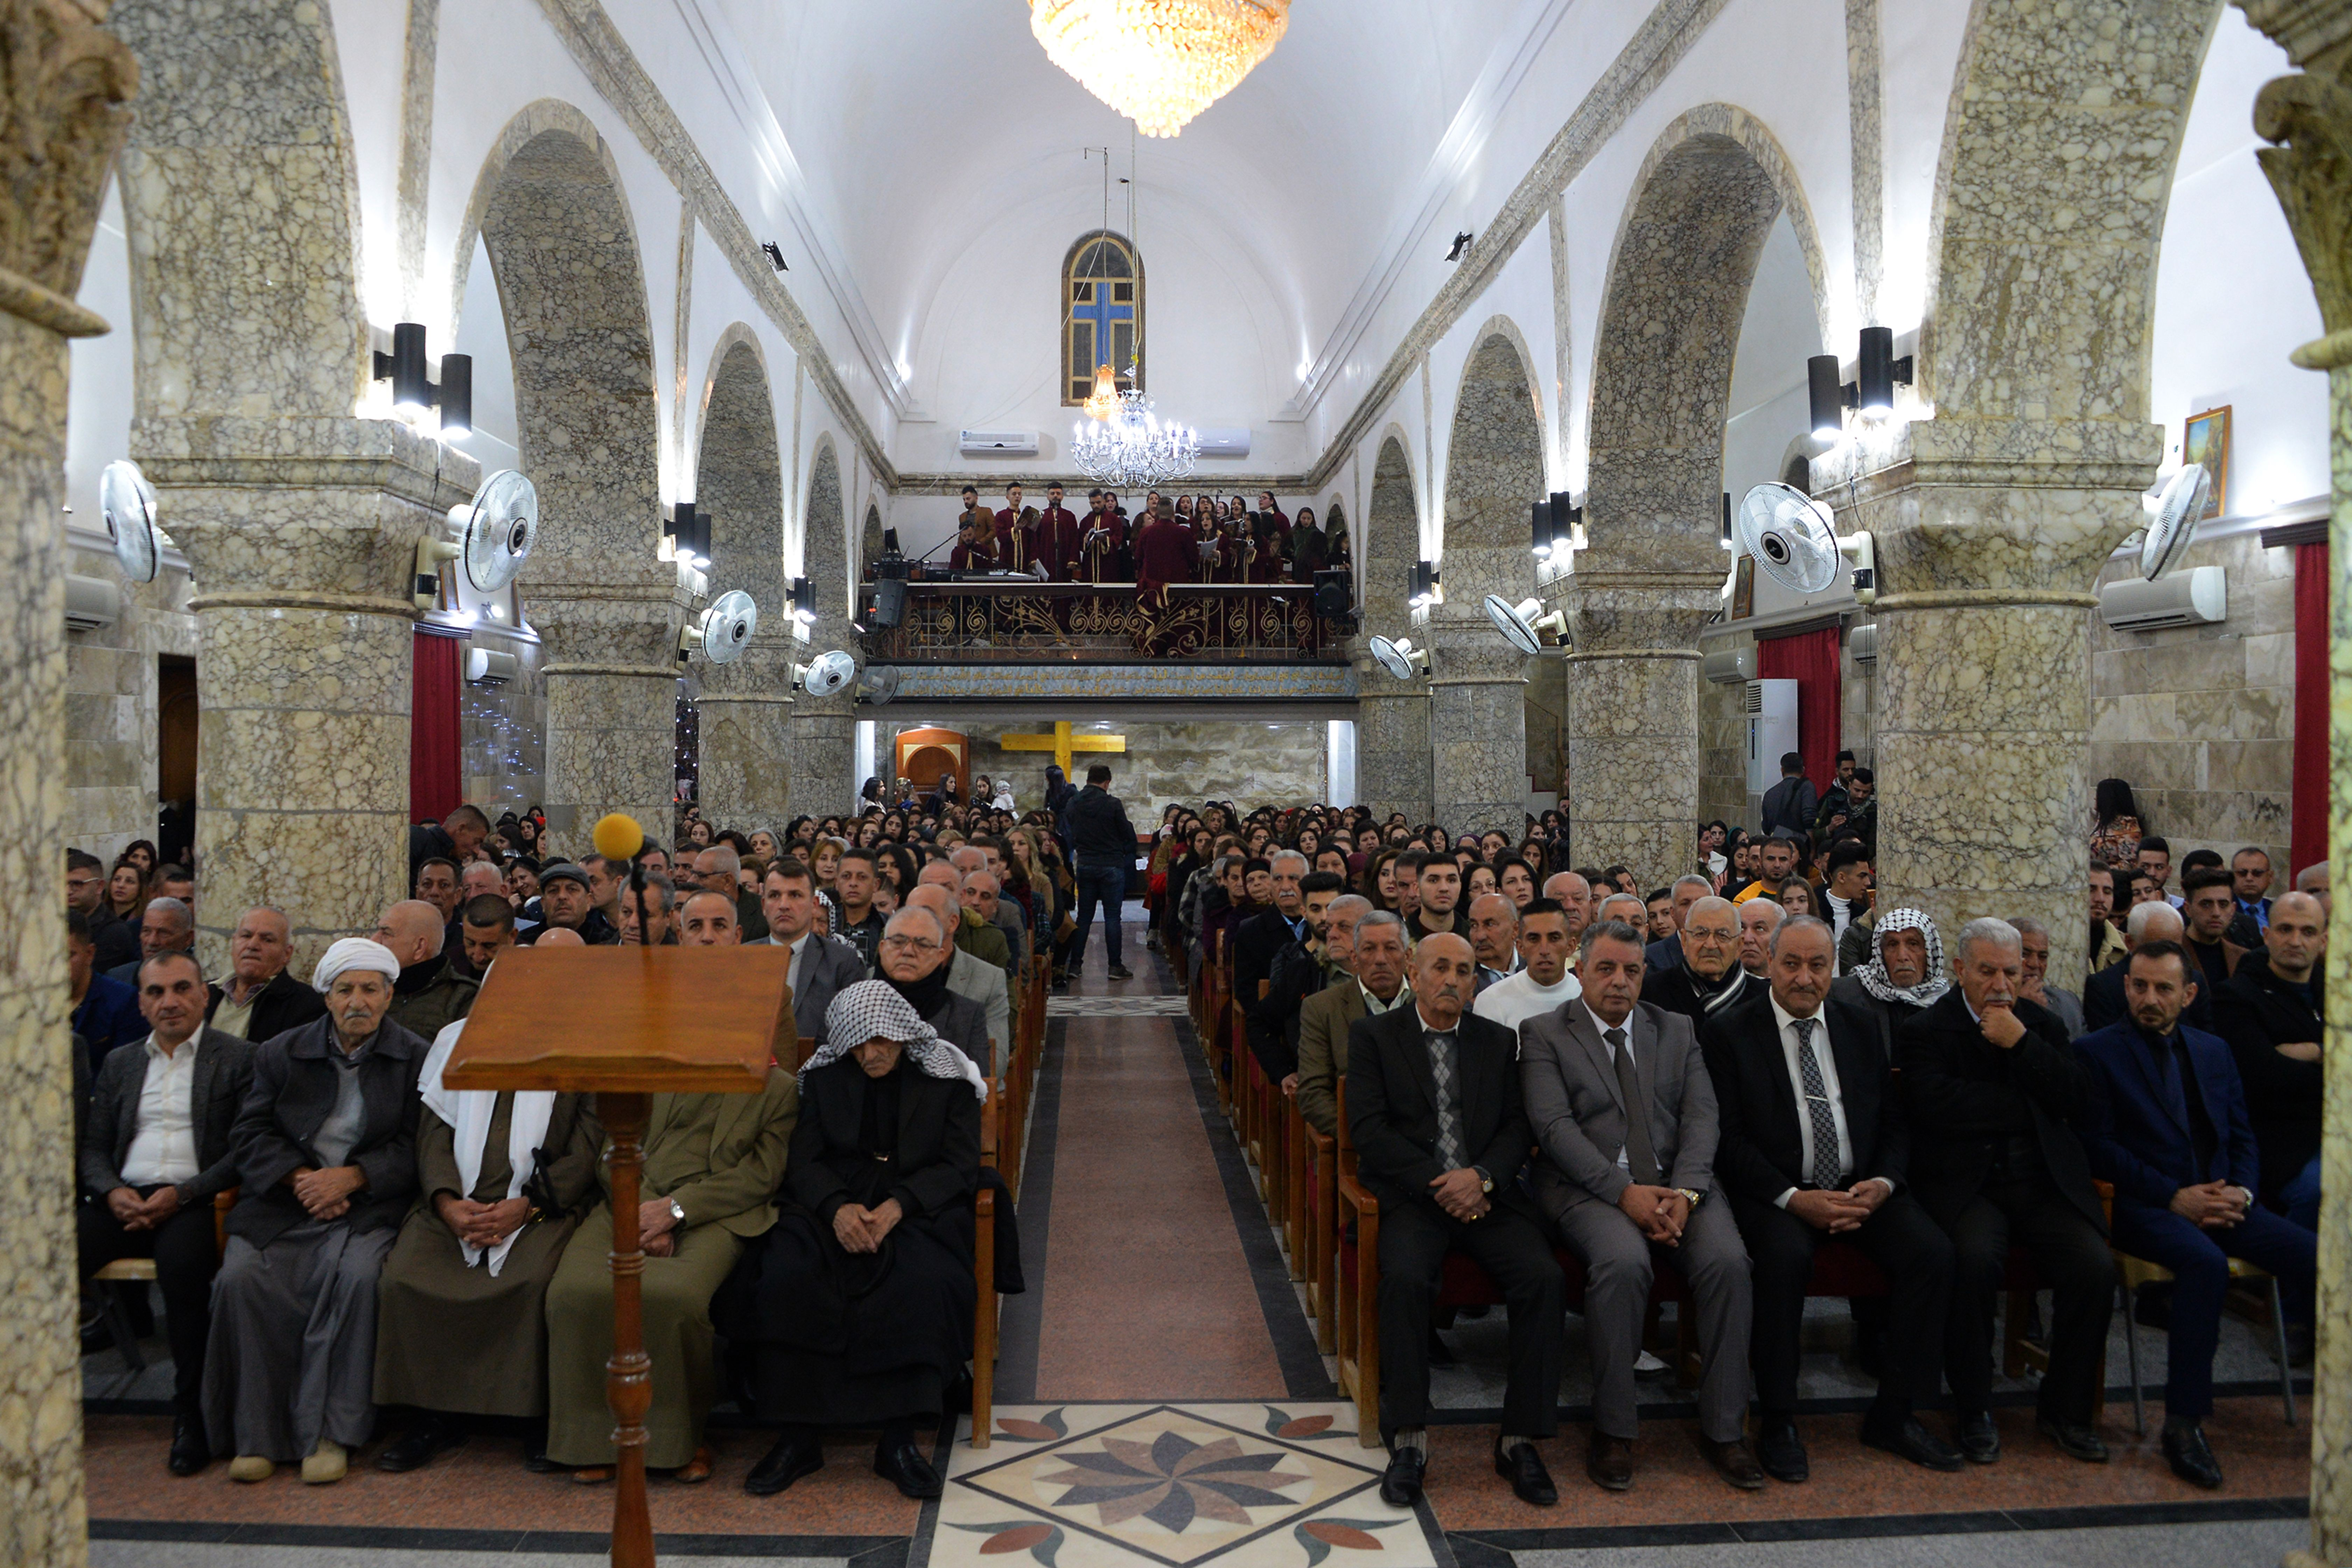 Iraqi Christians attend Christmas eve mass at the Syriac Catholic Church of Mar Jacob al-Muqataa in the predominantly Iraqi Christian town of Qaraqosh, in Niniveh province (Photo by ZAID AL-OBEIDI/AFP via Getty Images)